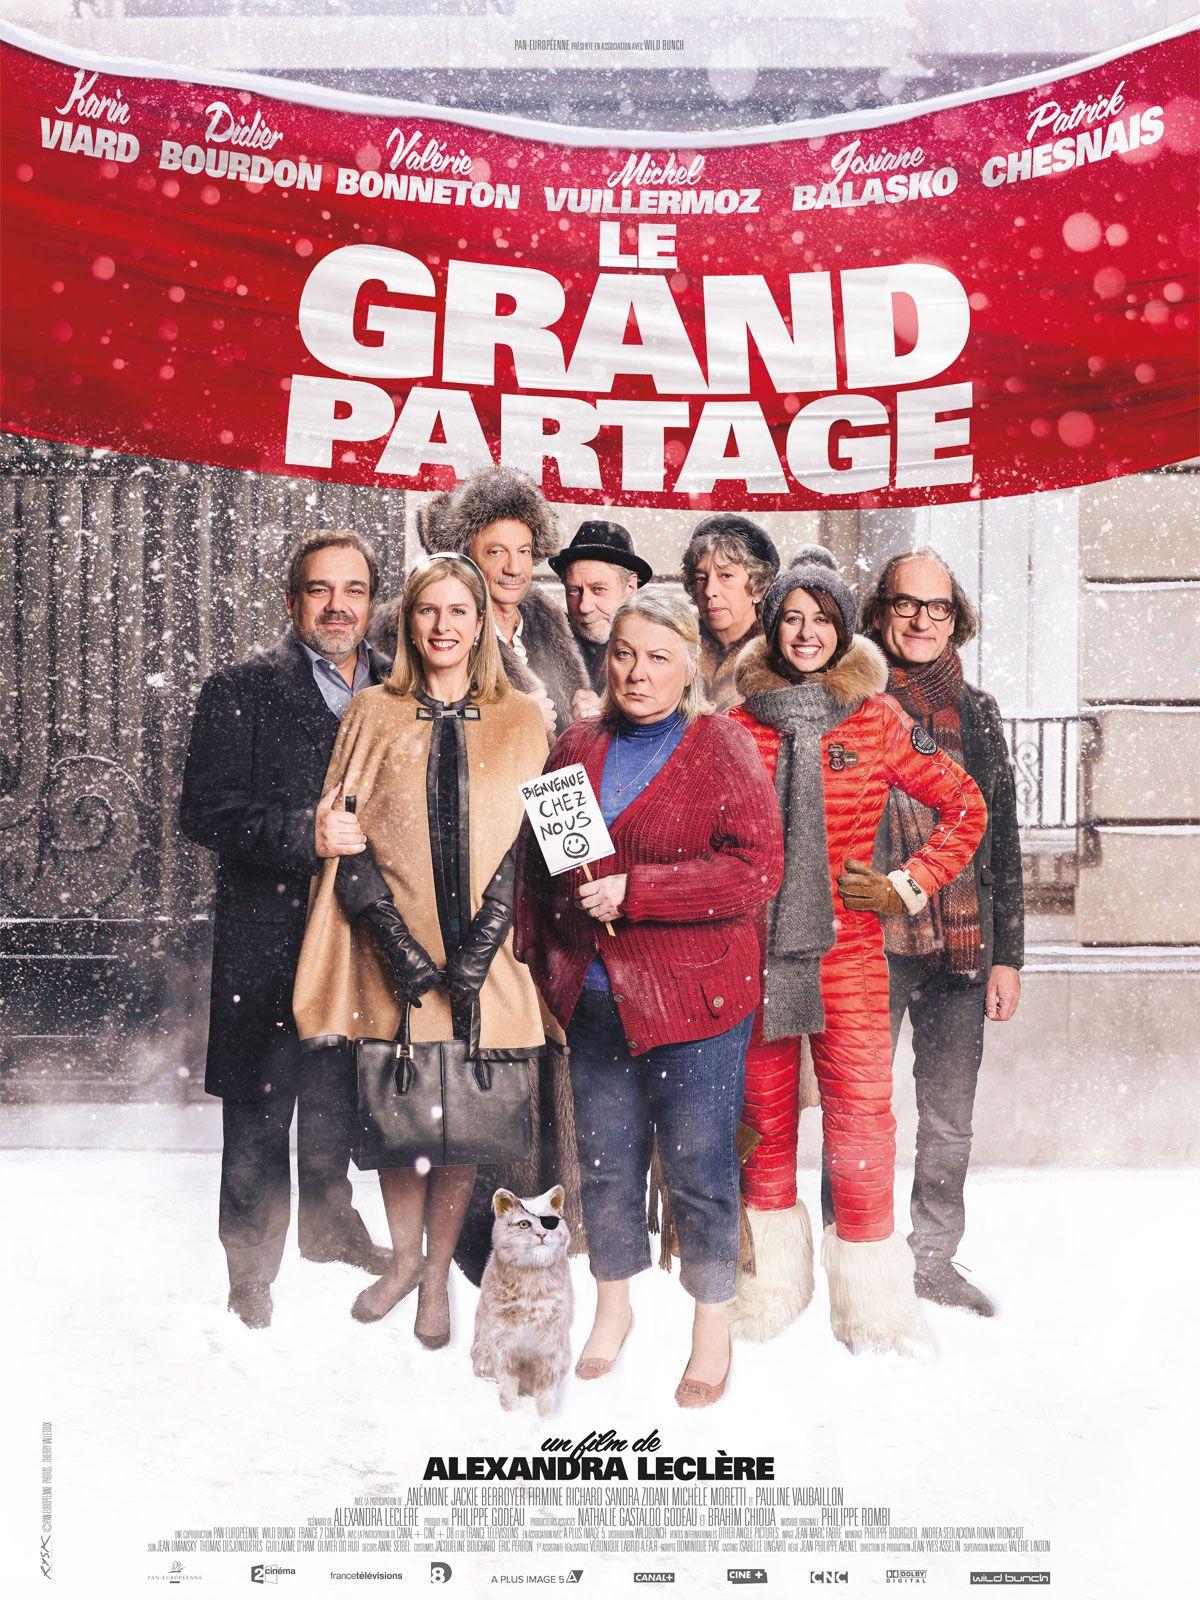 Le Grand Partage - Film (2015)